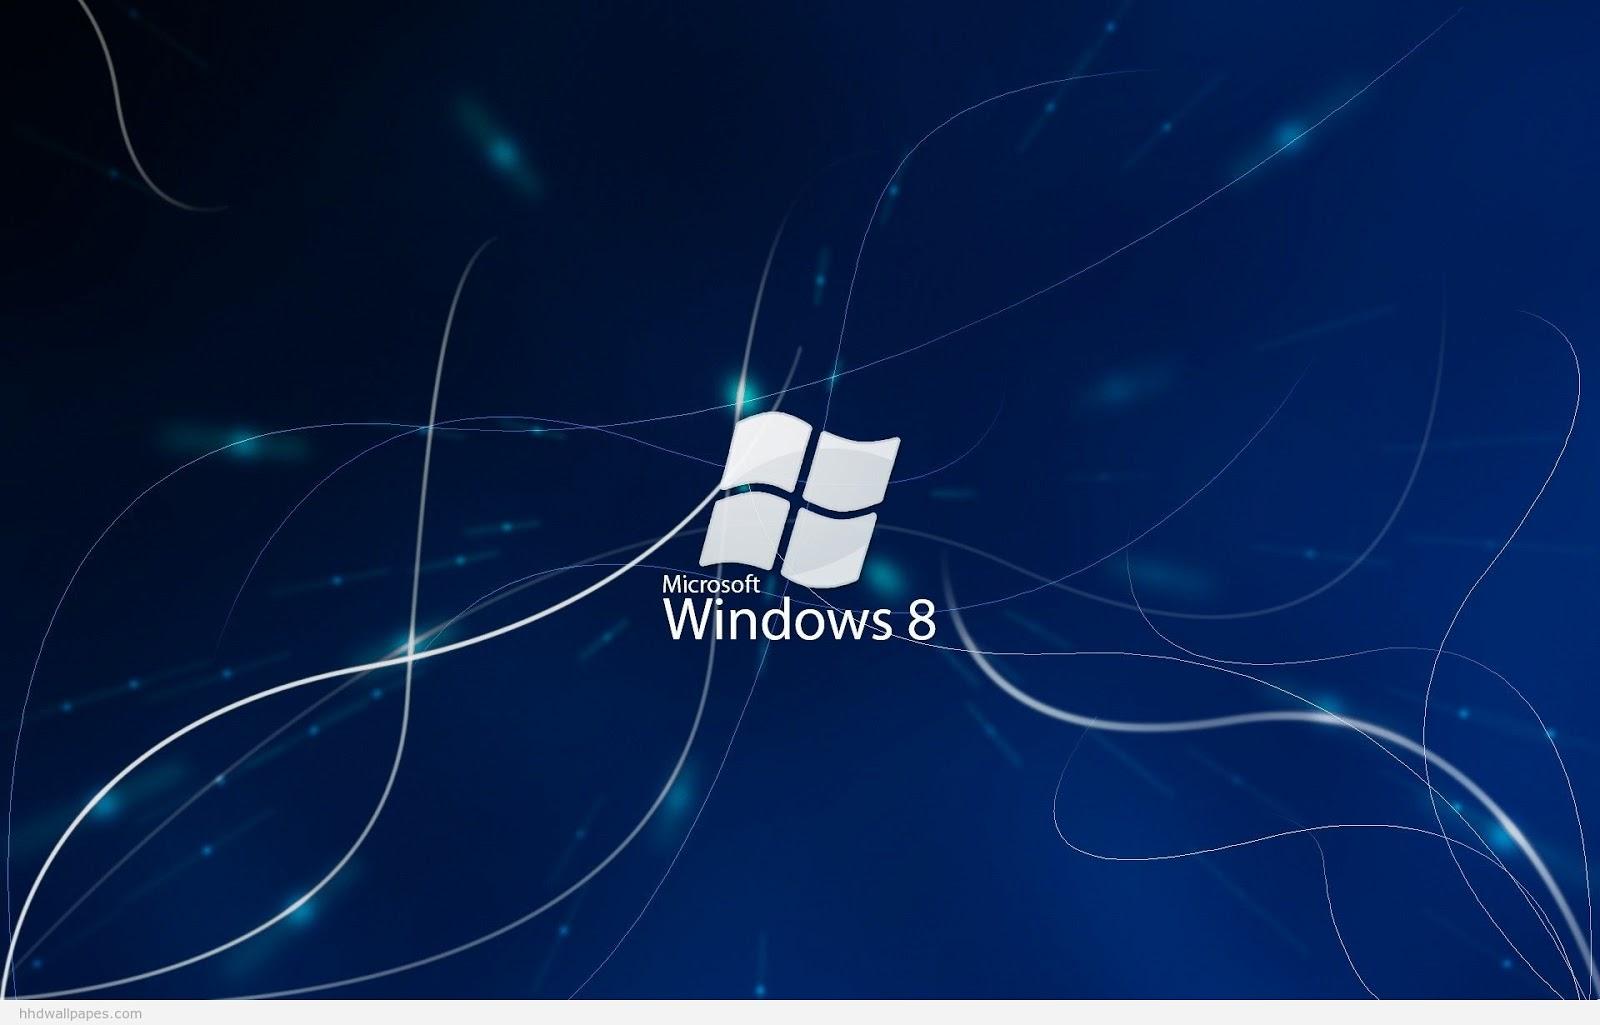 Windows 8 Wallpapers Release: 3D Wallpapers: Window 8 Wallpapers